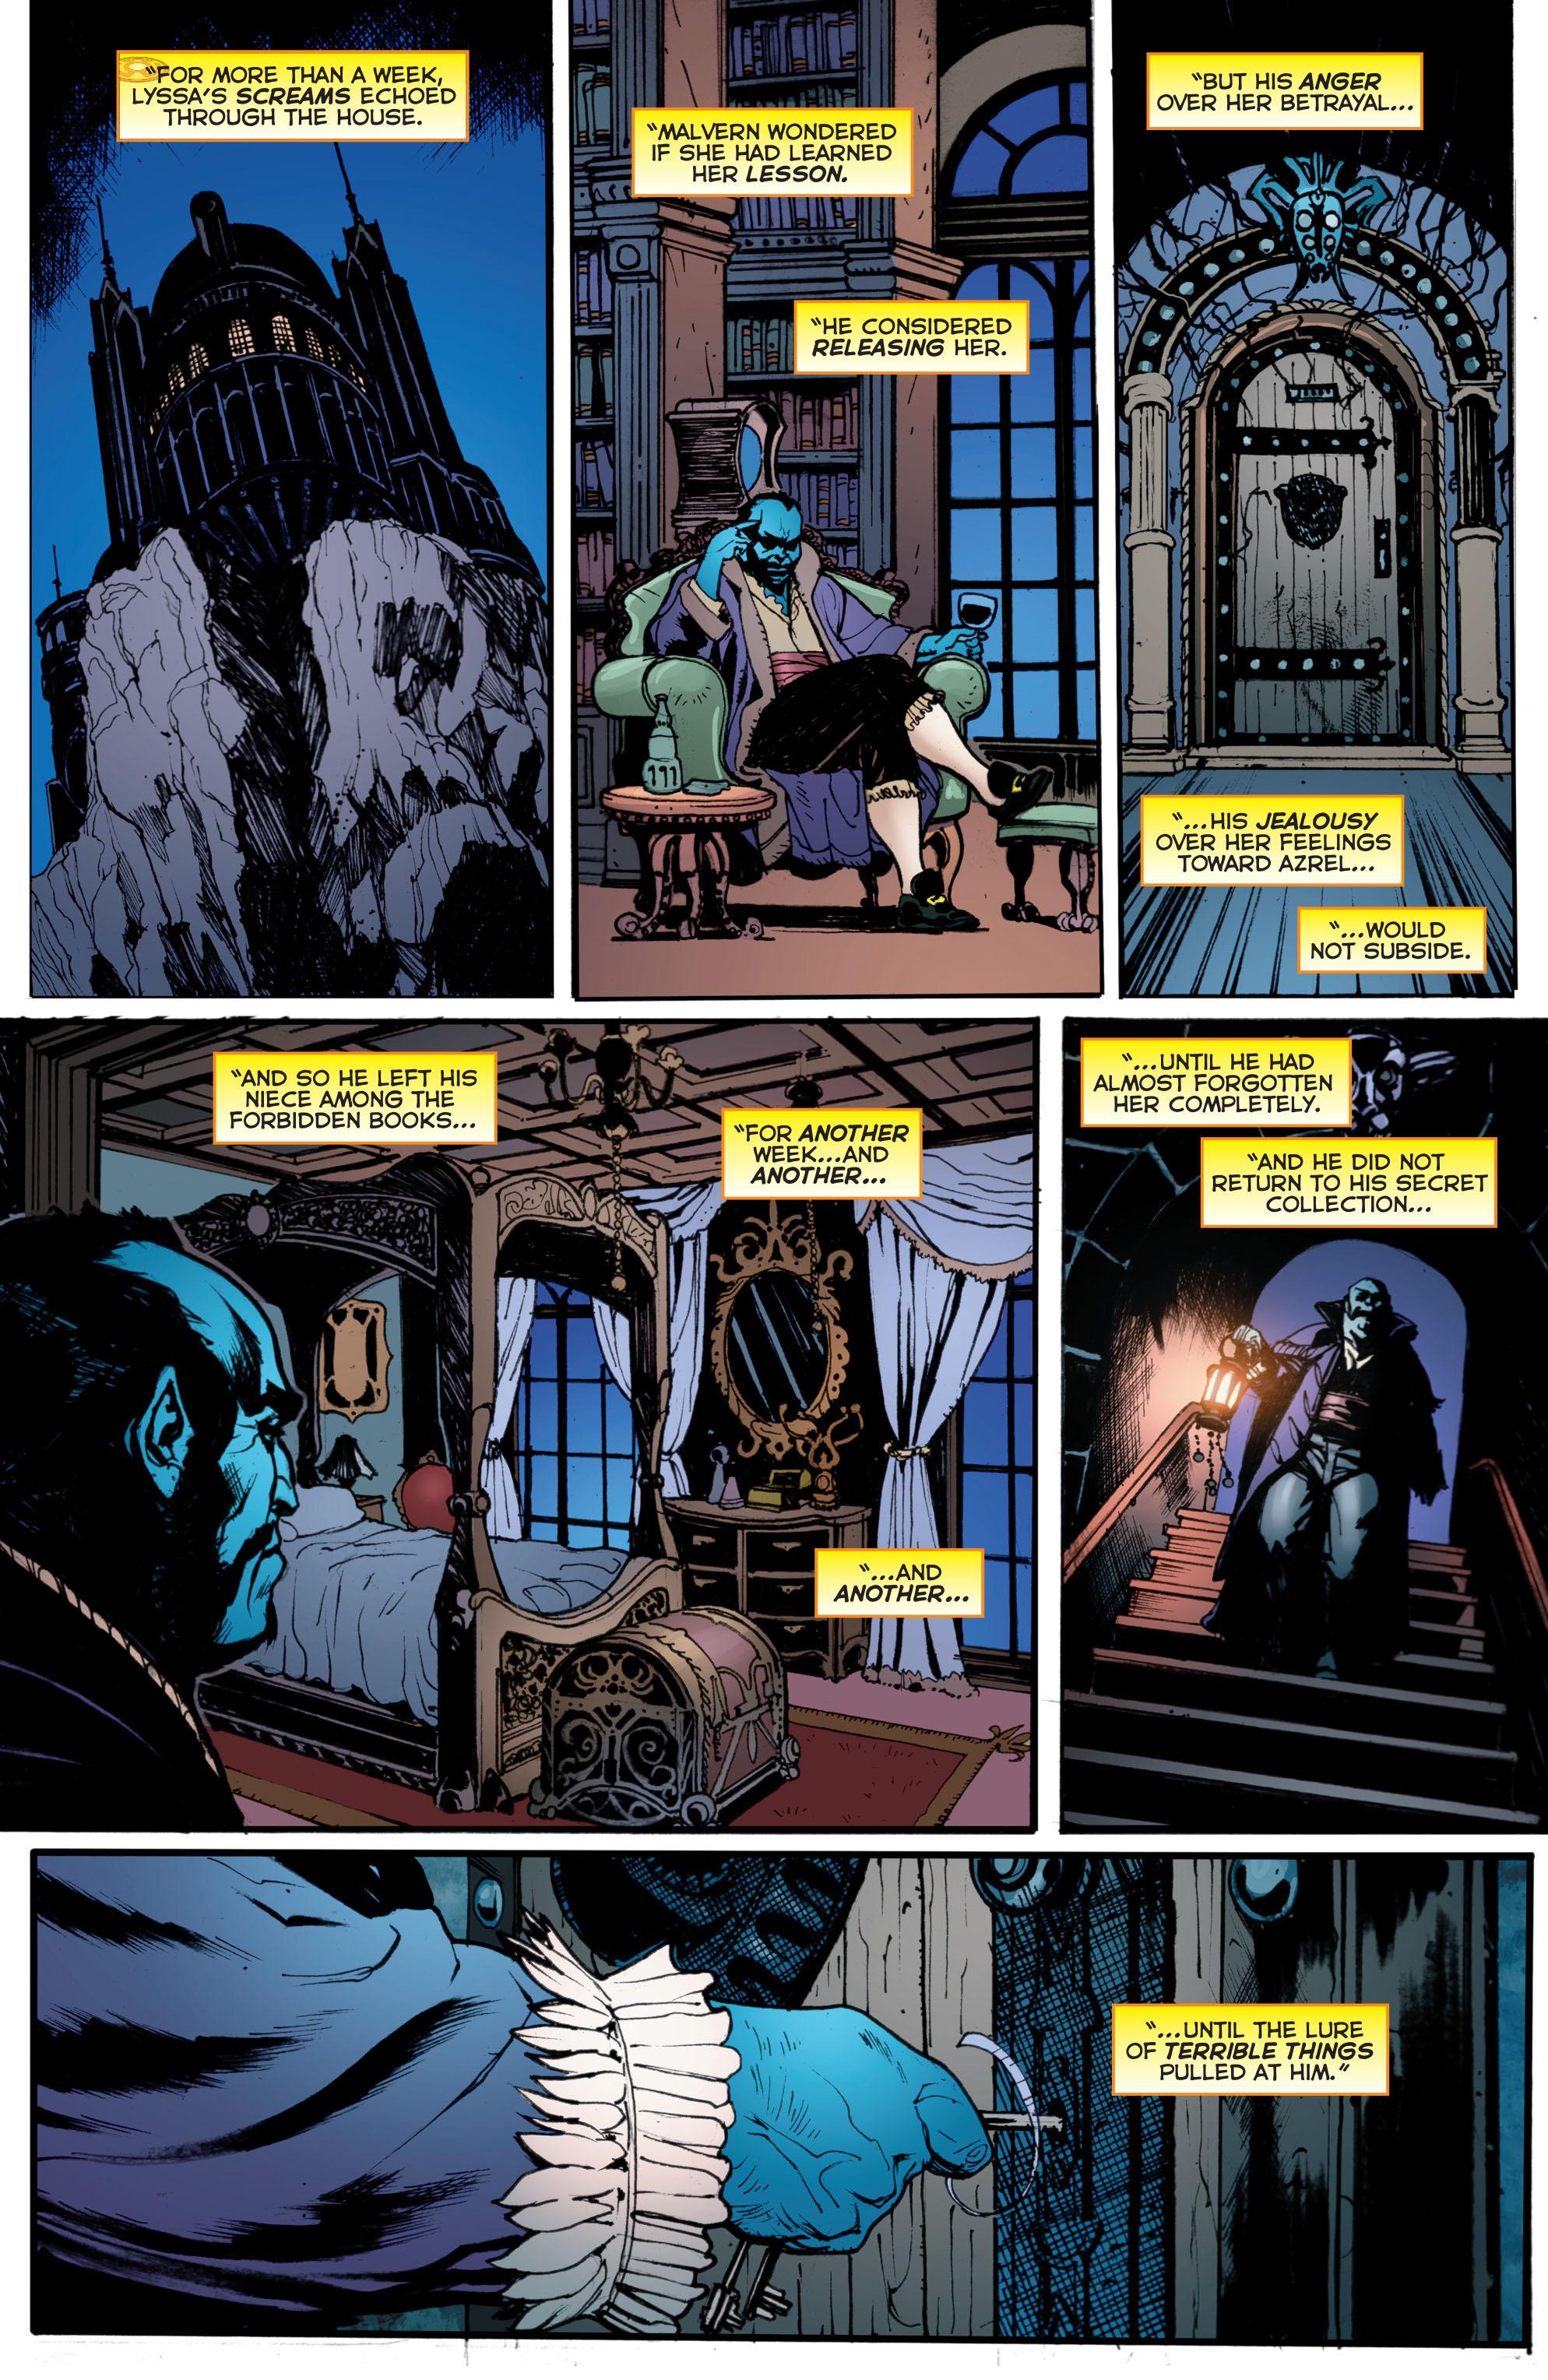 Read online Sinestro comic -  Issue # Annual 1 - 19